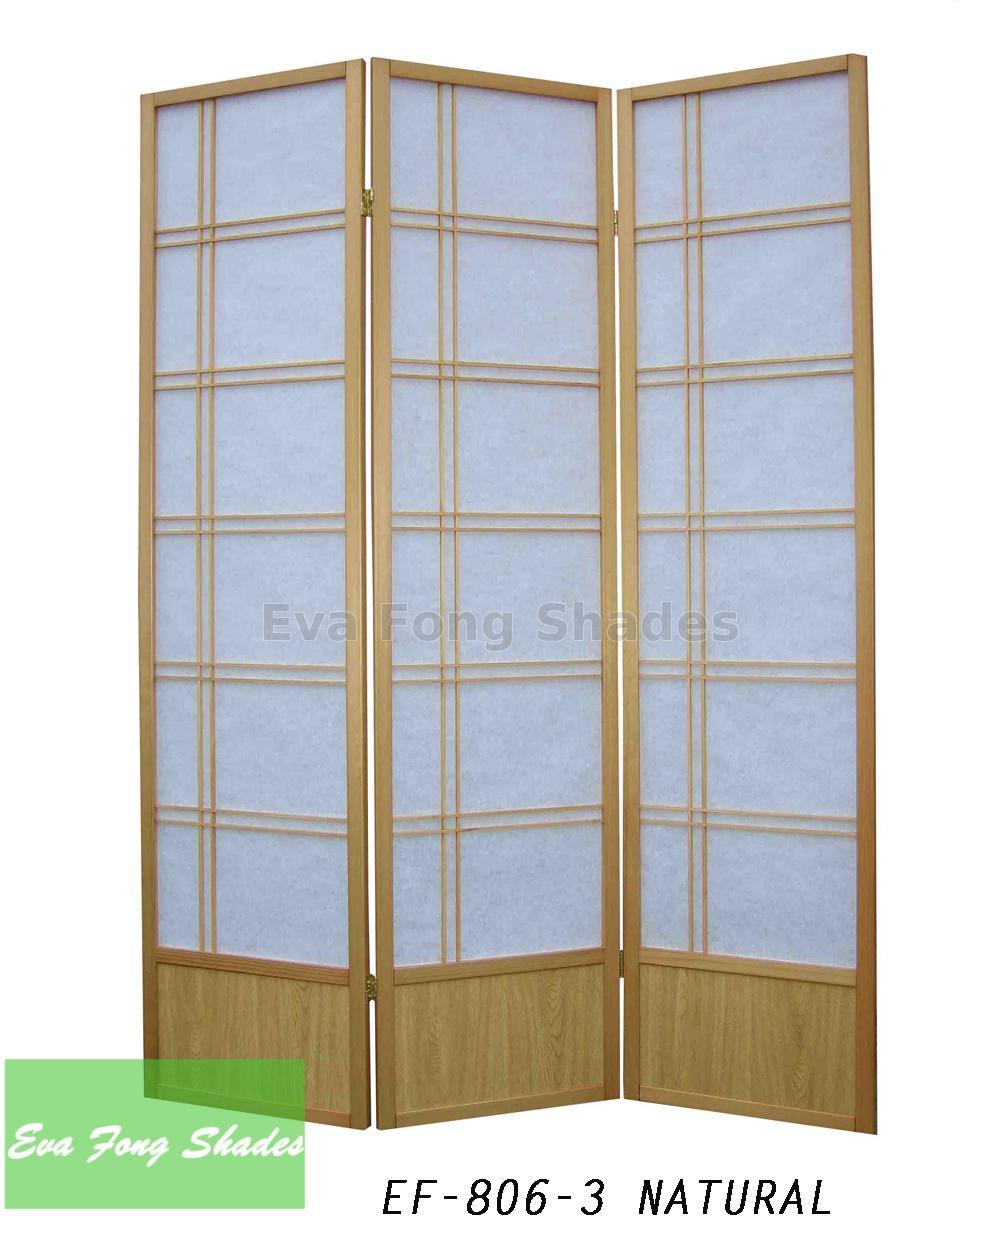 Wooden Screen Room Divider Folding Partition Shoji Screen Japanese Screen Privacy Screen Taiwantrade Com